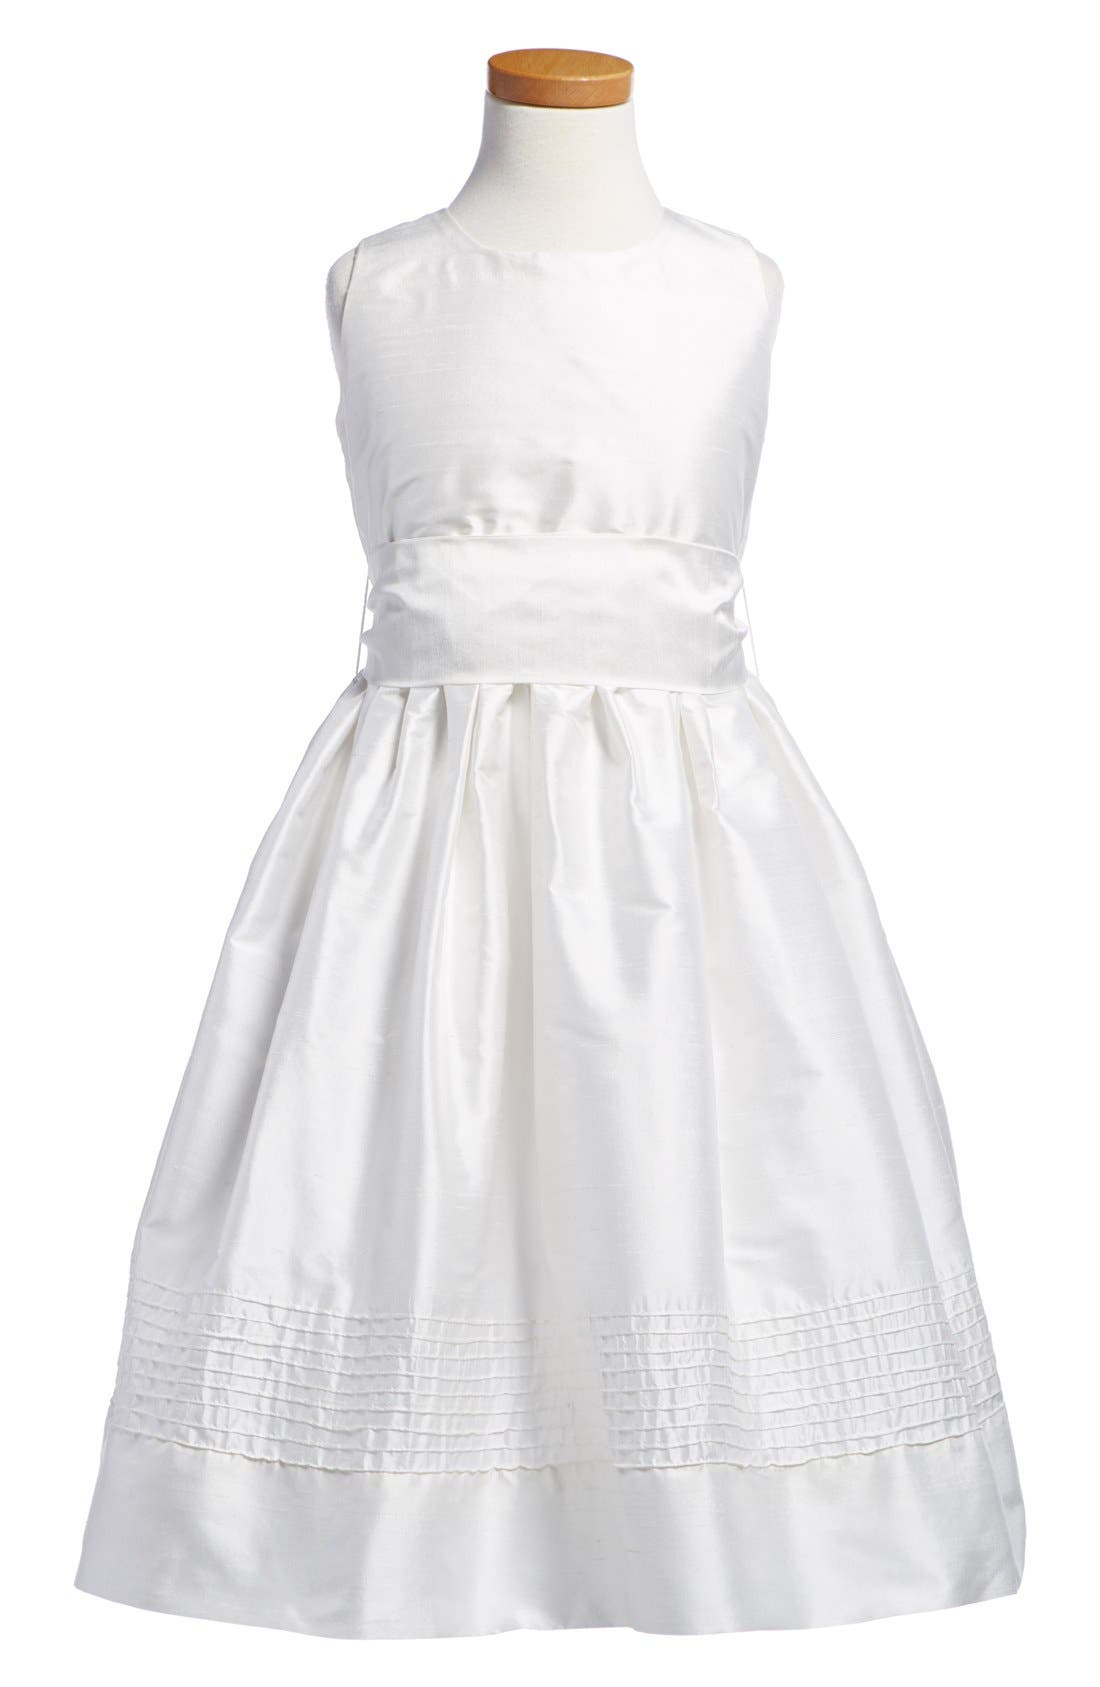 Isabel Garreton 'Timeless' Sleeveless Dress (Little Girls & Big Girls)